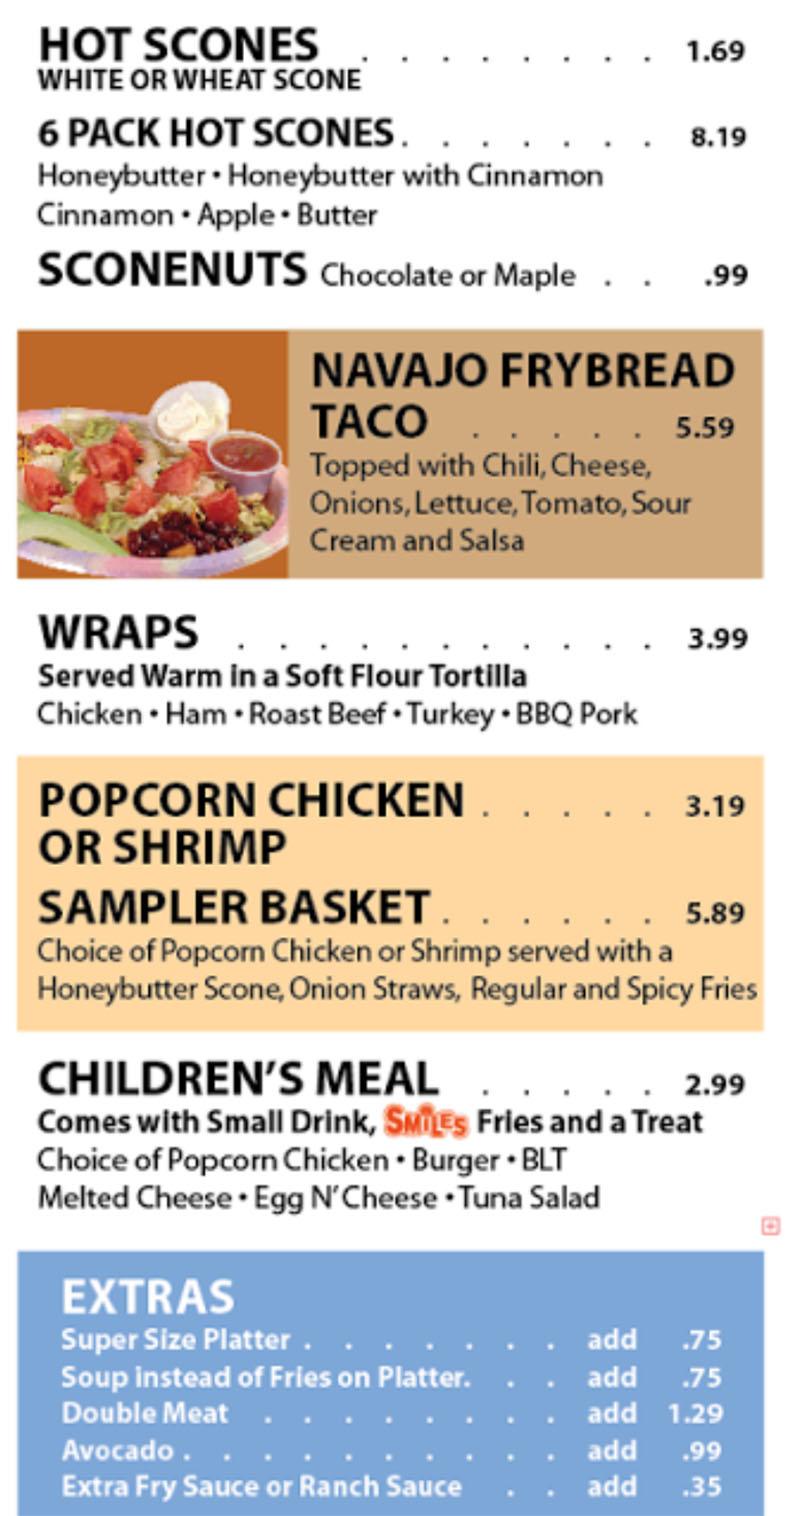 Sconecutter menu - scones, wraps, kids, extras